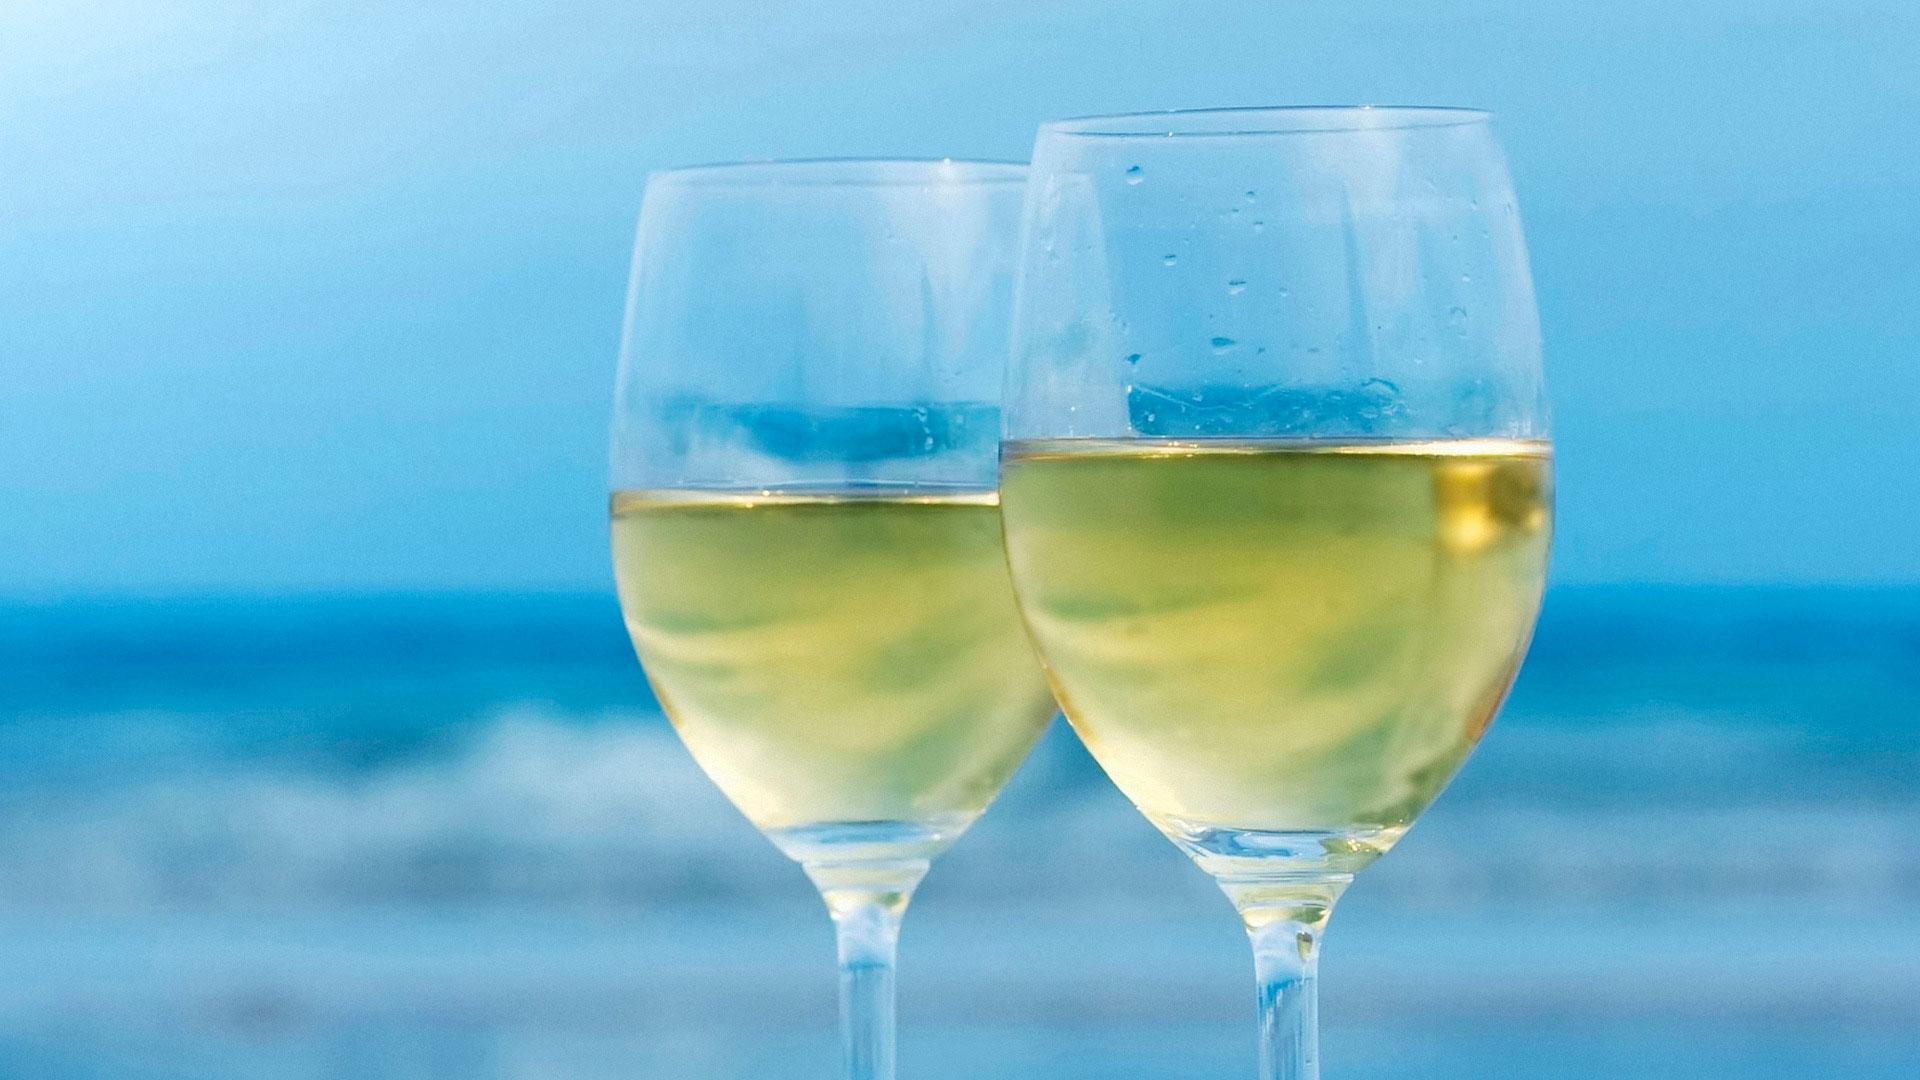 Обои Вино на двоих, картинки - Обои для ...: www.fullhdoboi.ru/photo/love/vino_na_dvoikh/34-0-15391